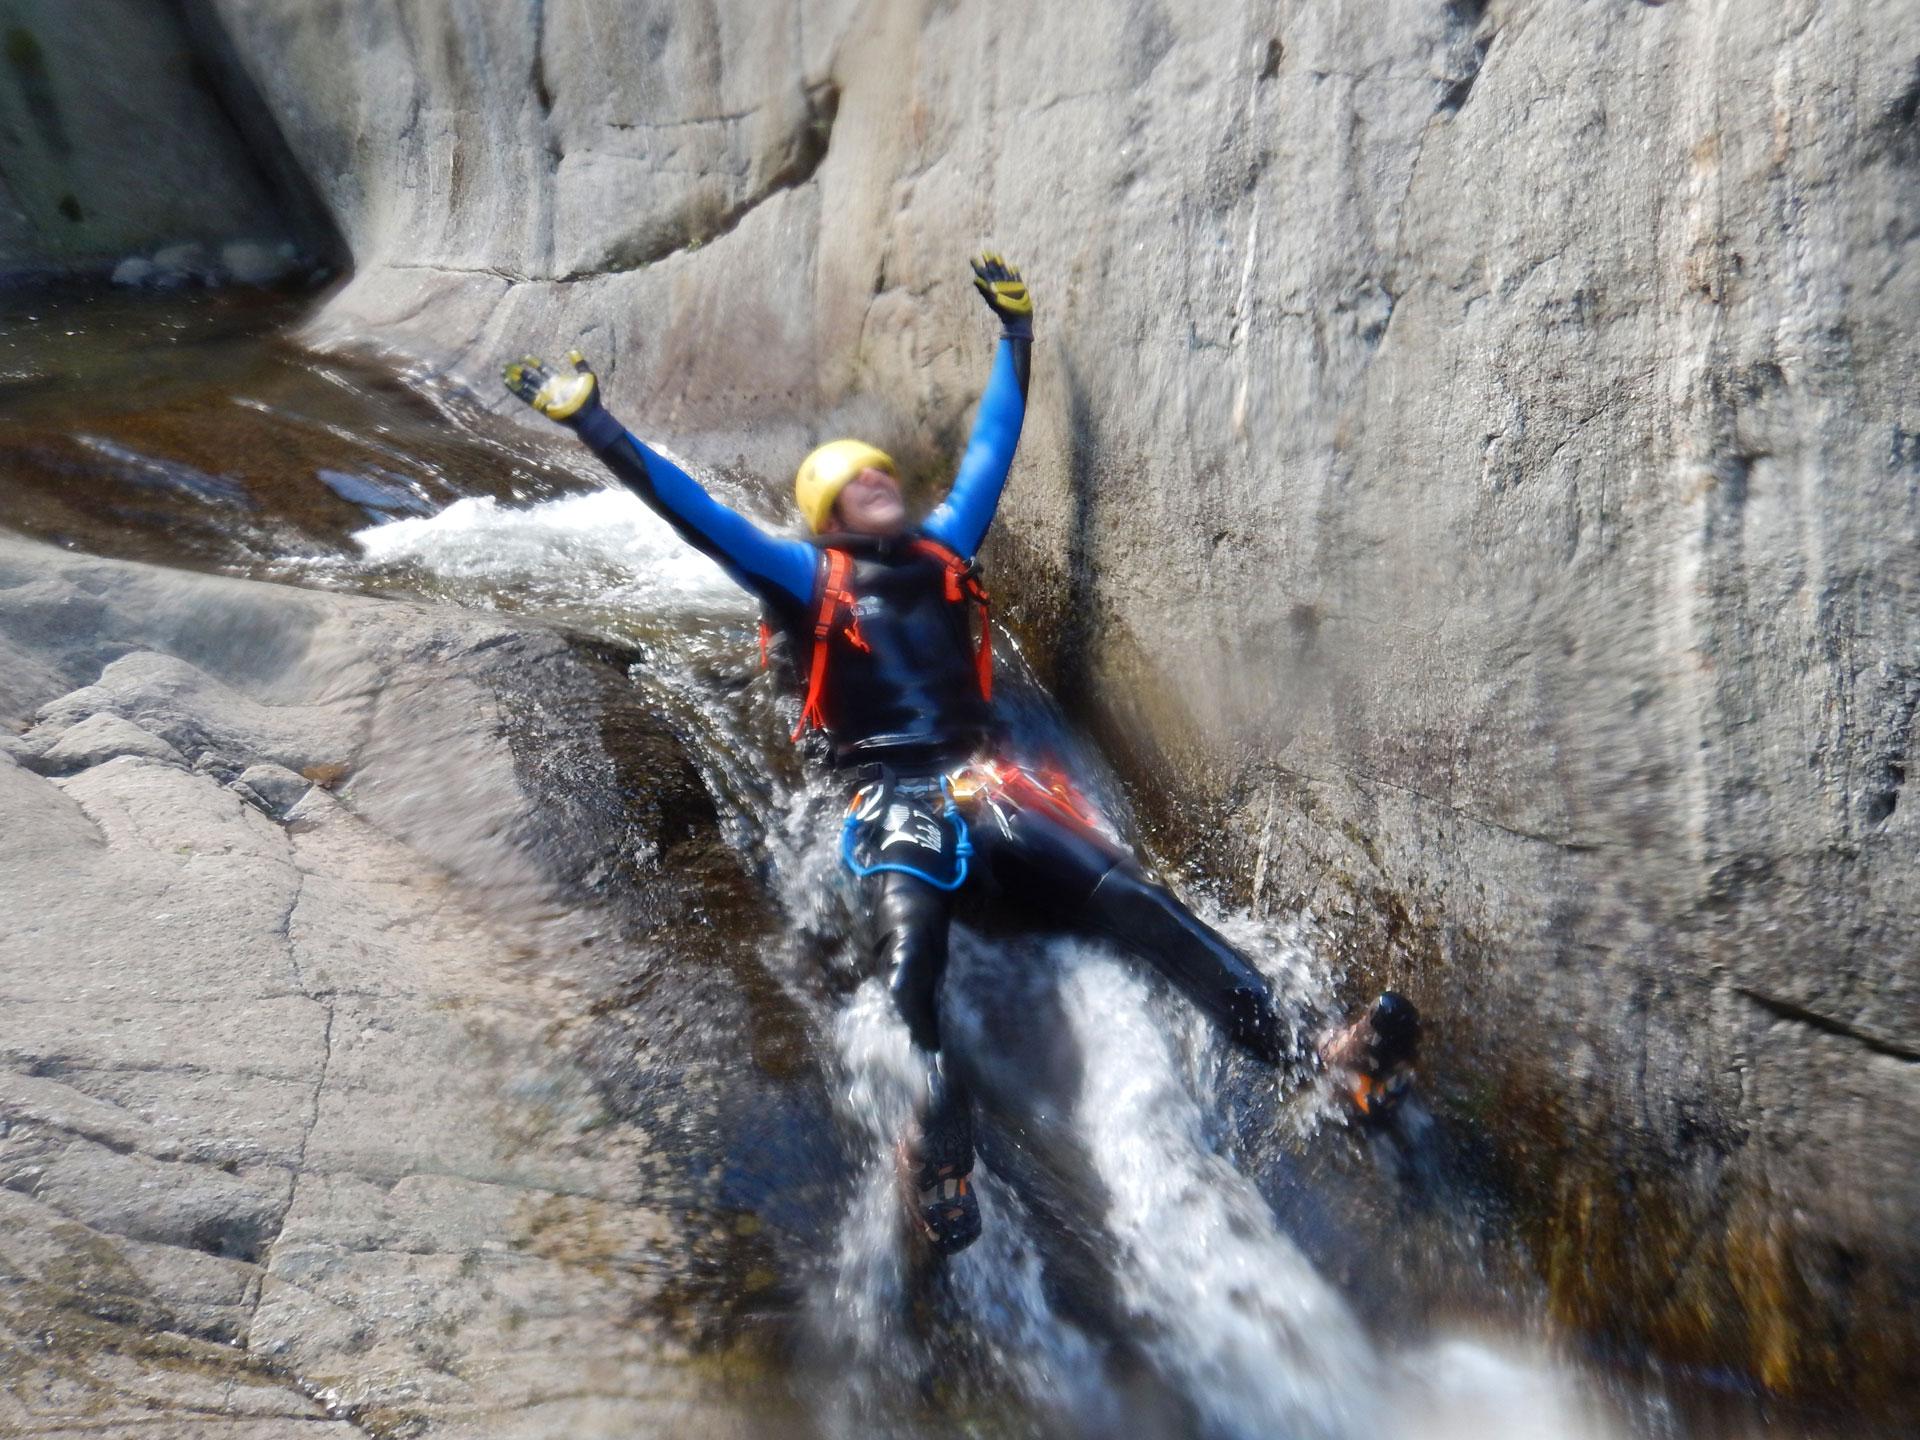 Canyoning en Ariège, Toboggan au canyon de llech dans les Pyrénées Orientales - Vertikarst